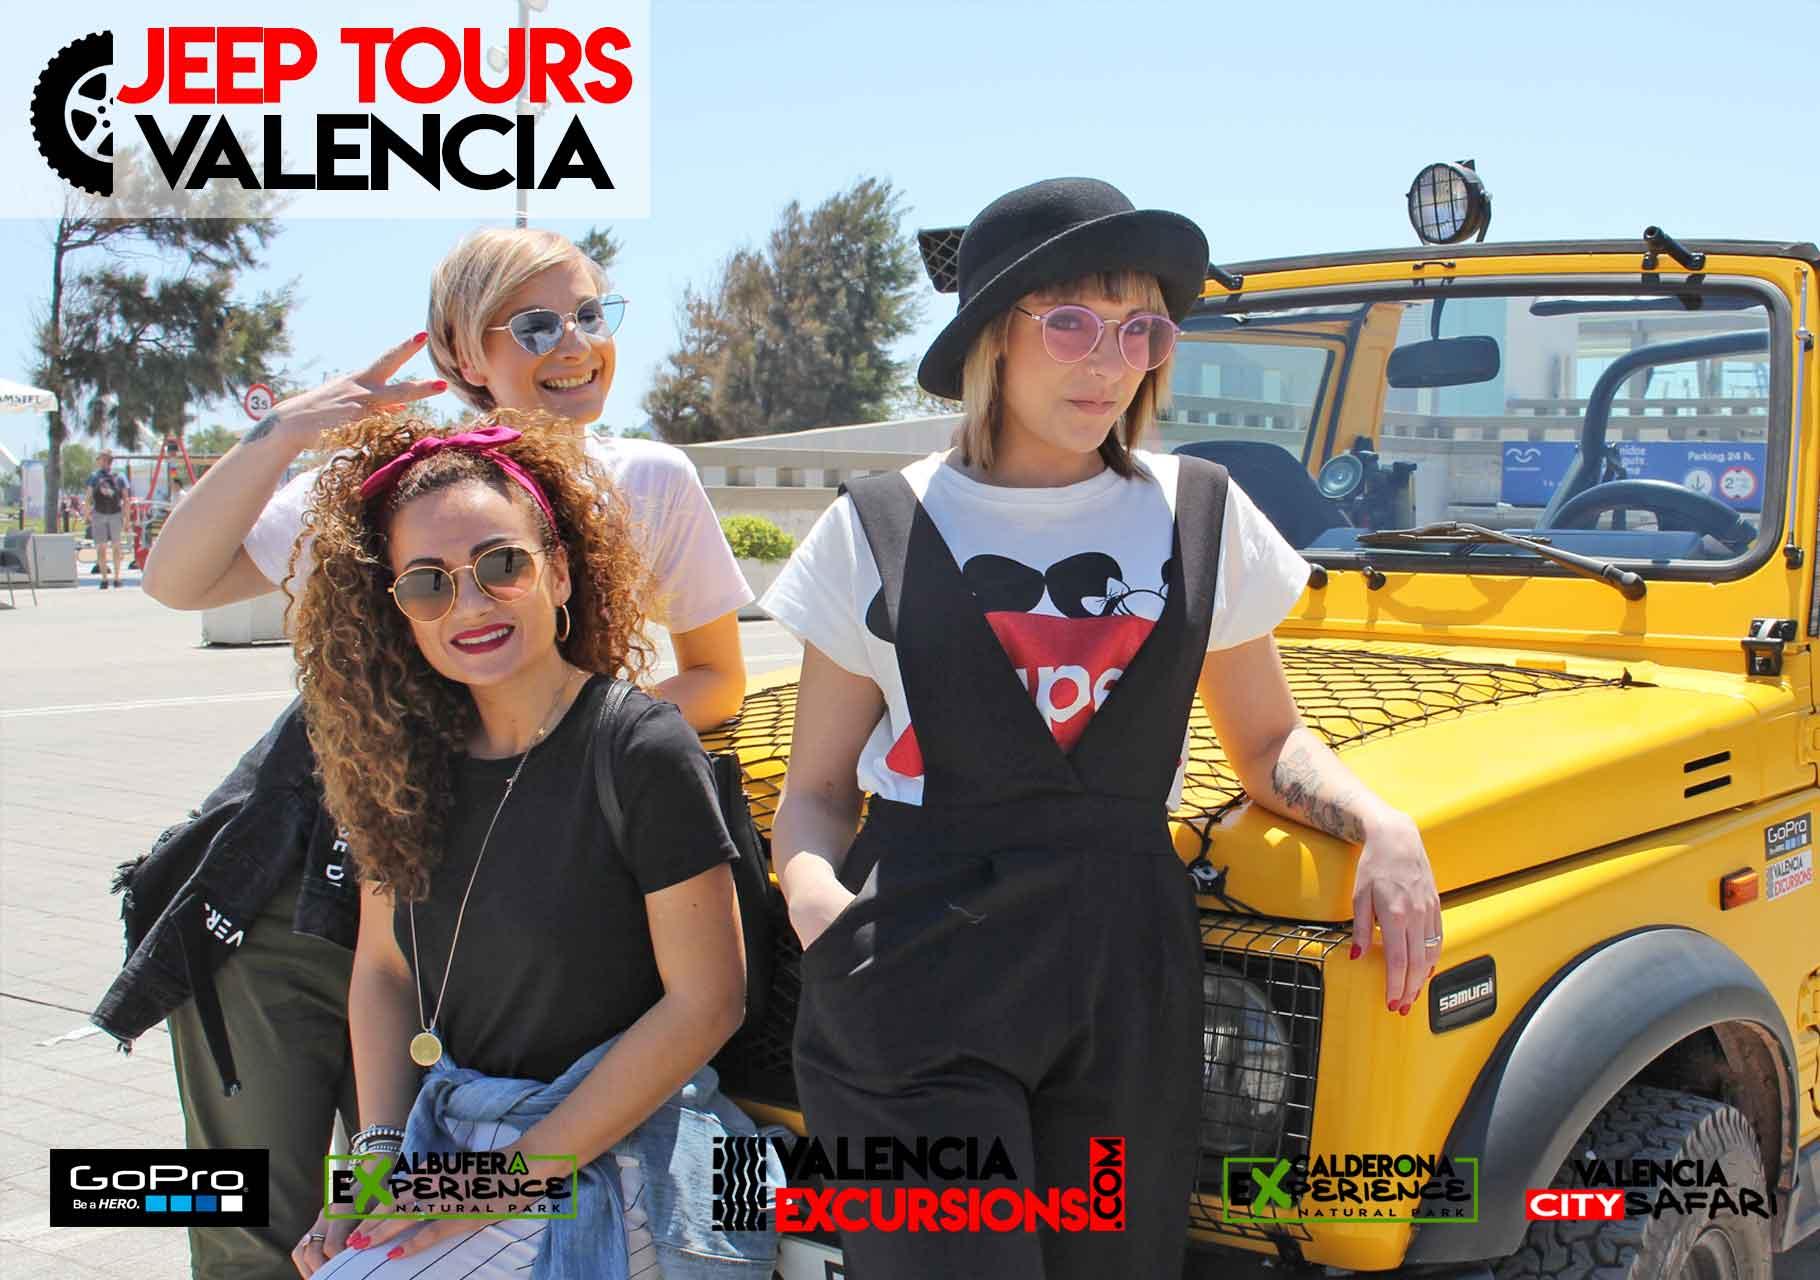 Valencia Excursions jeep tours